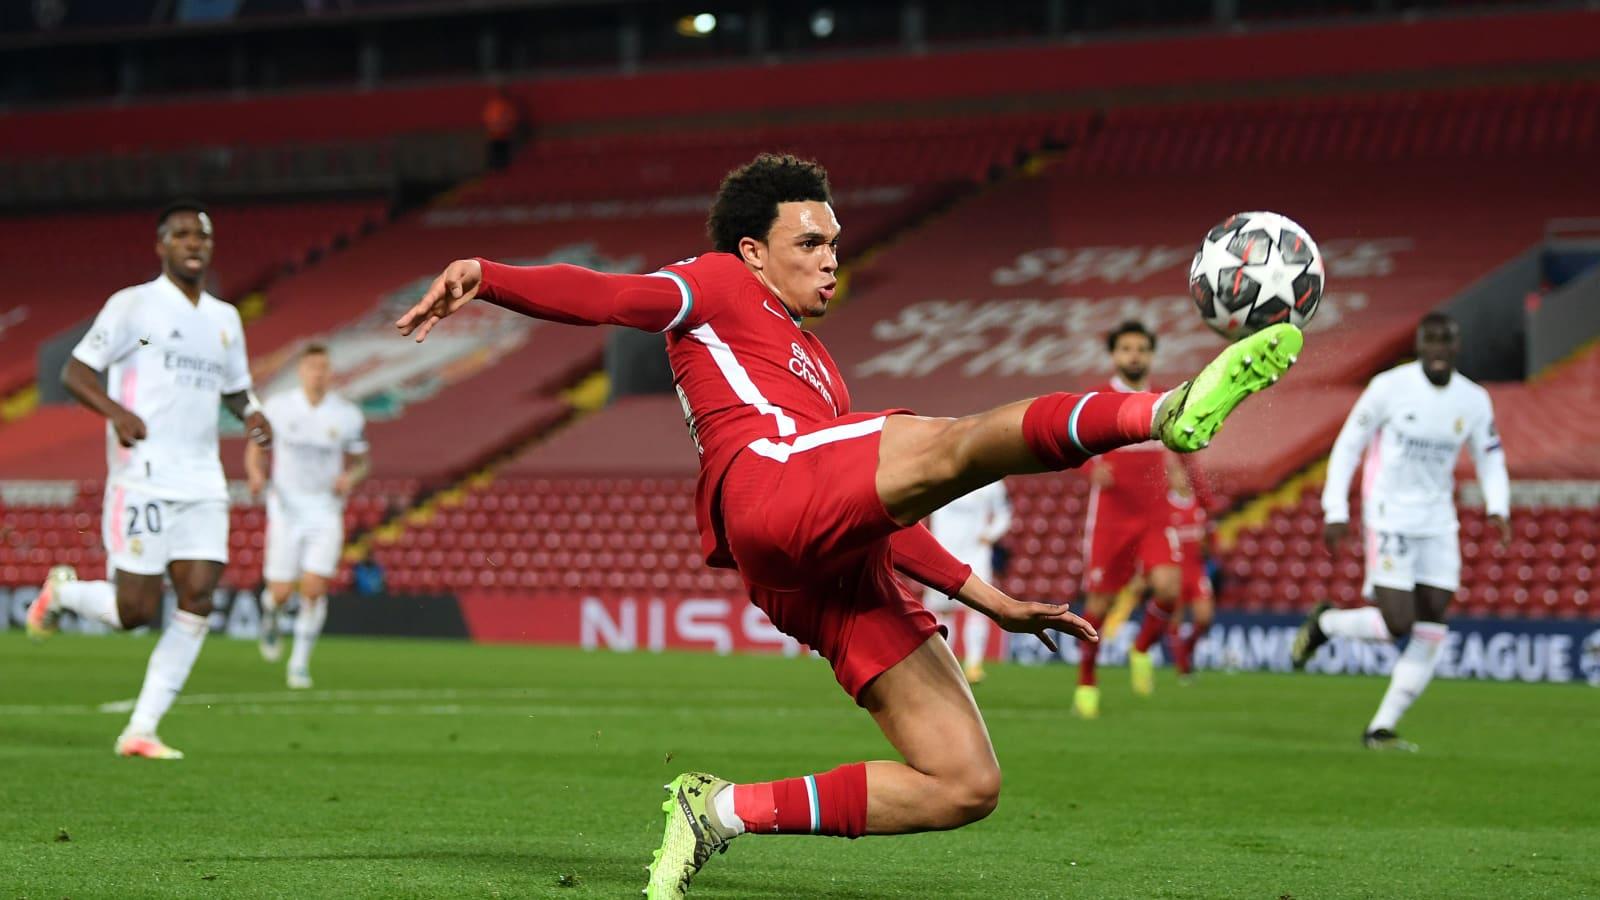 Soccer: European Super League announces 12 football clubs, 6 from England